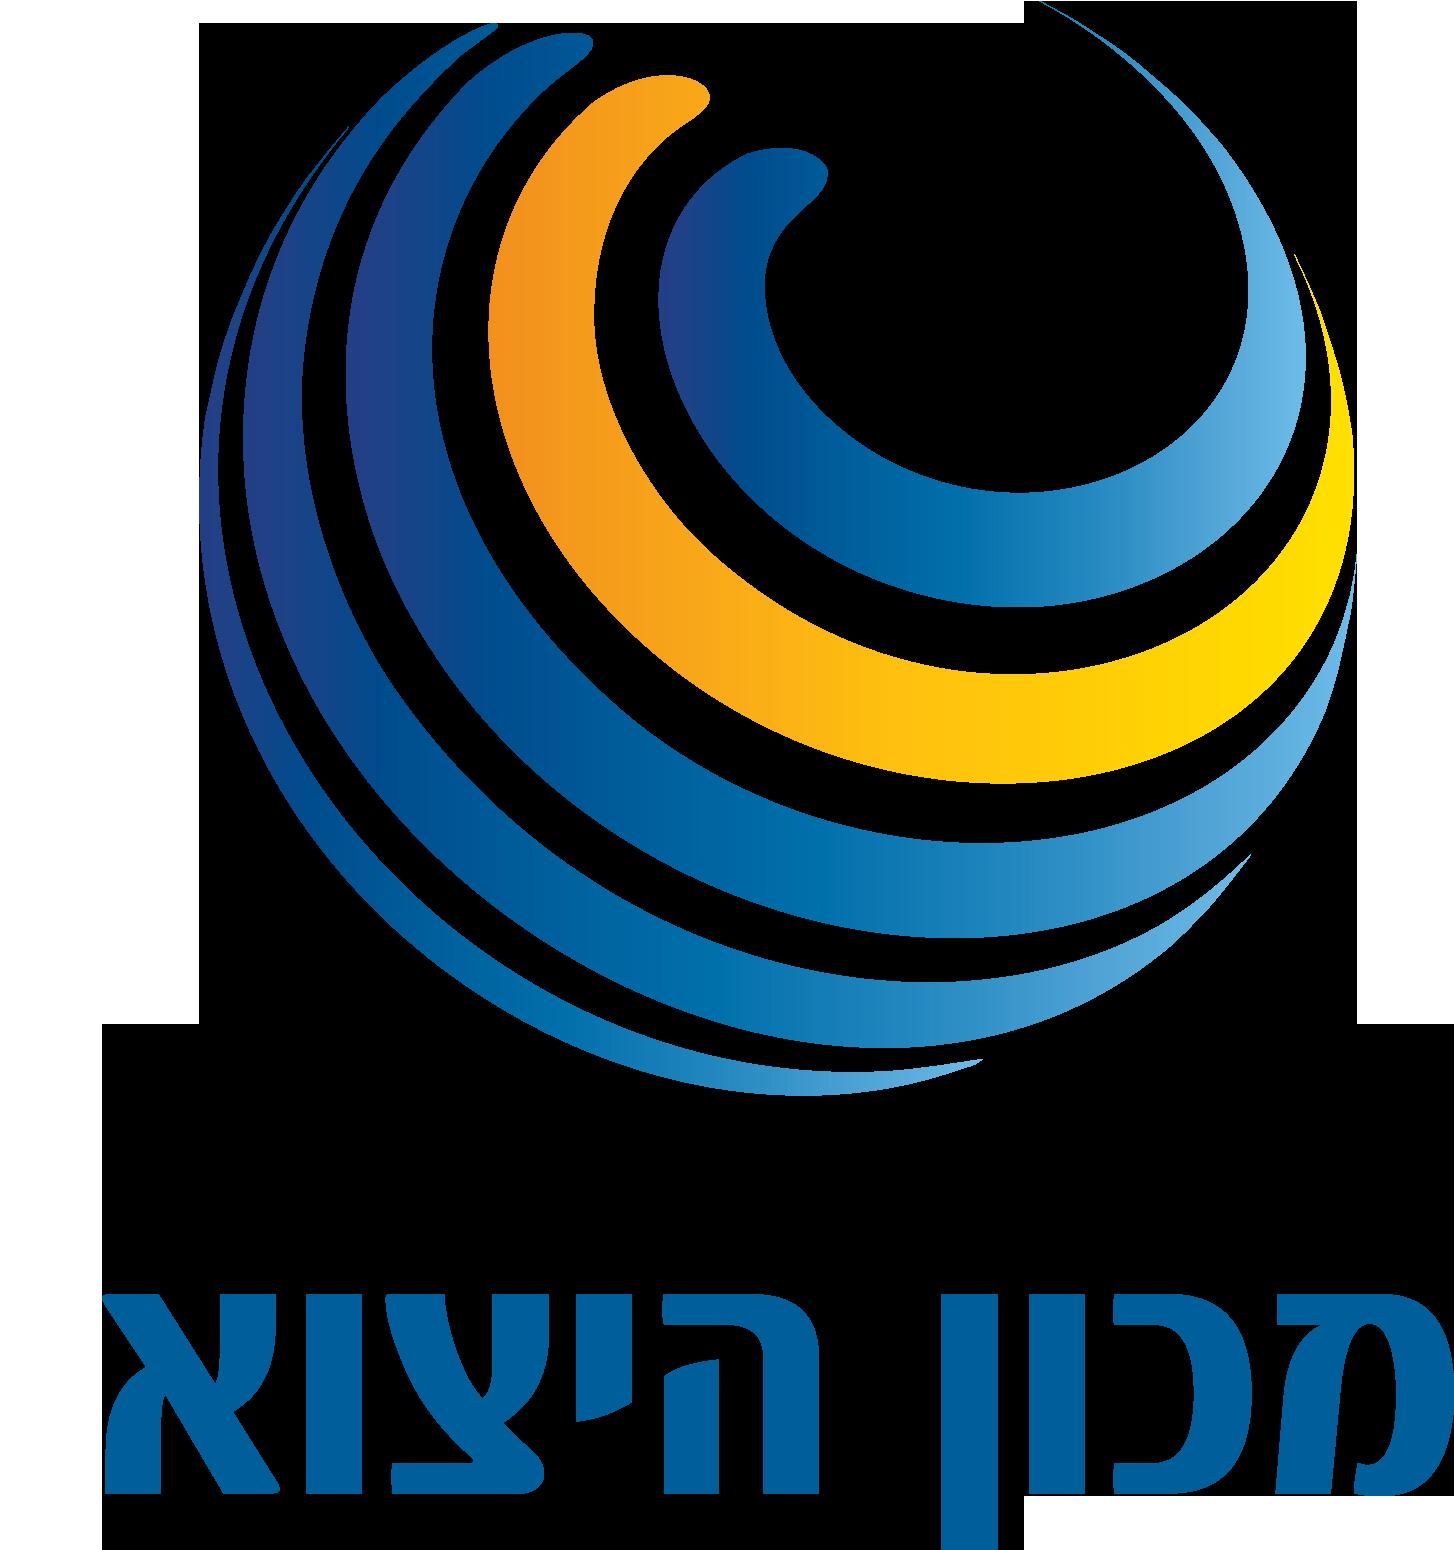 כנס מוצרי צריכה 2018 - logo